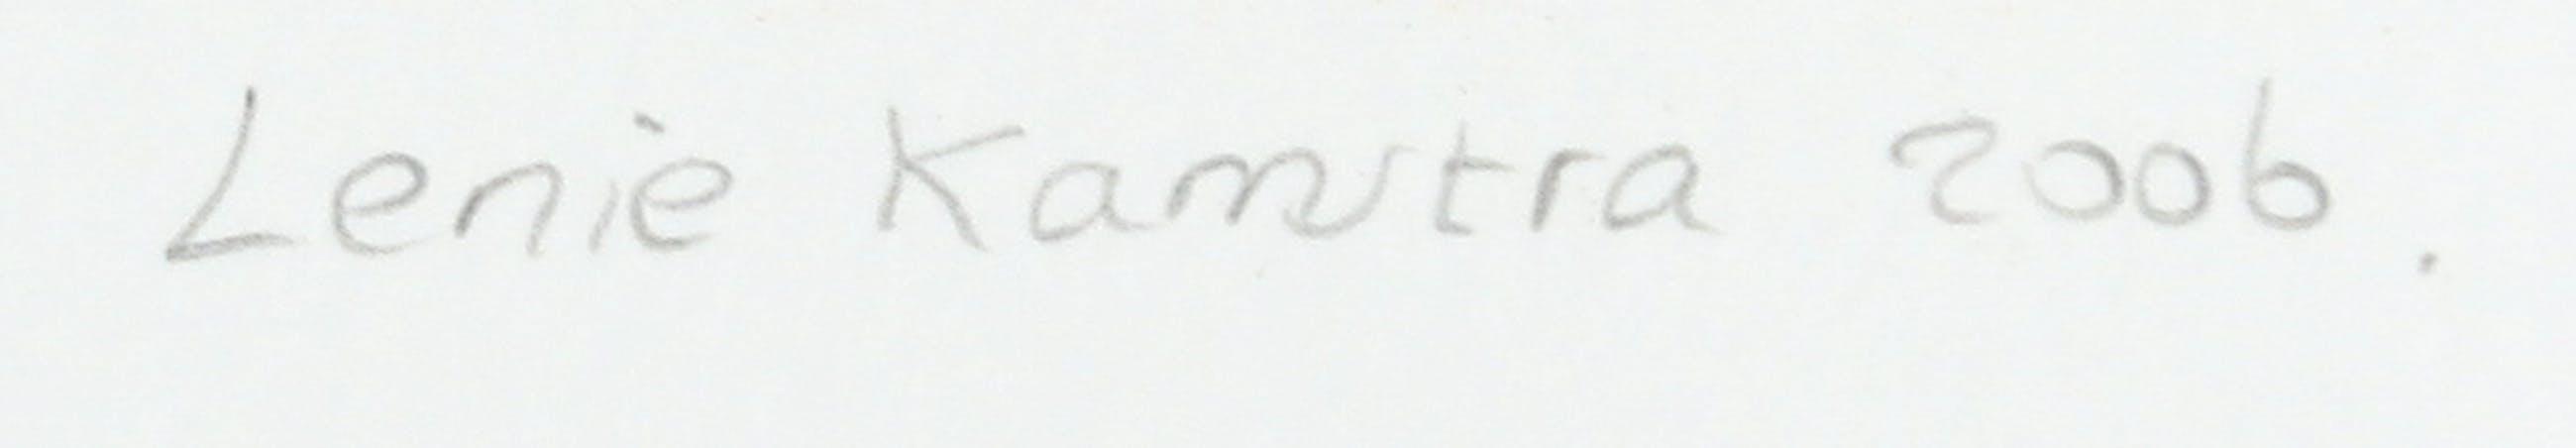 Lenie Kamstra - Litho, Queen of Samo kopen? Bied vanaf 1!